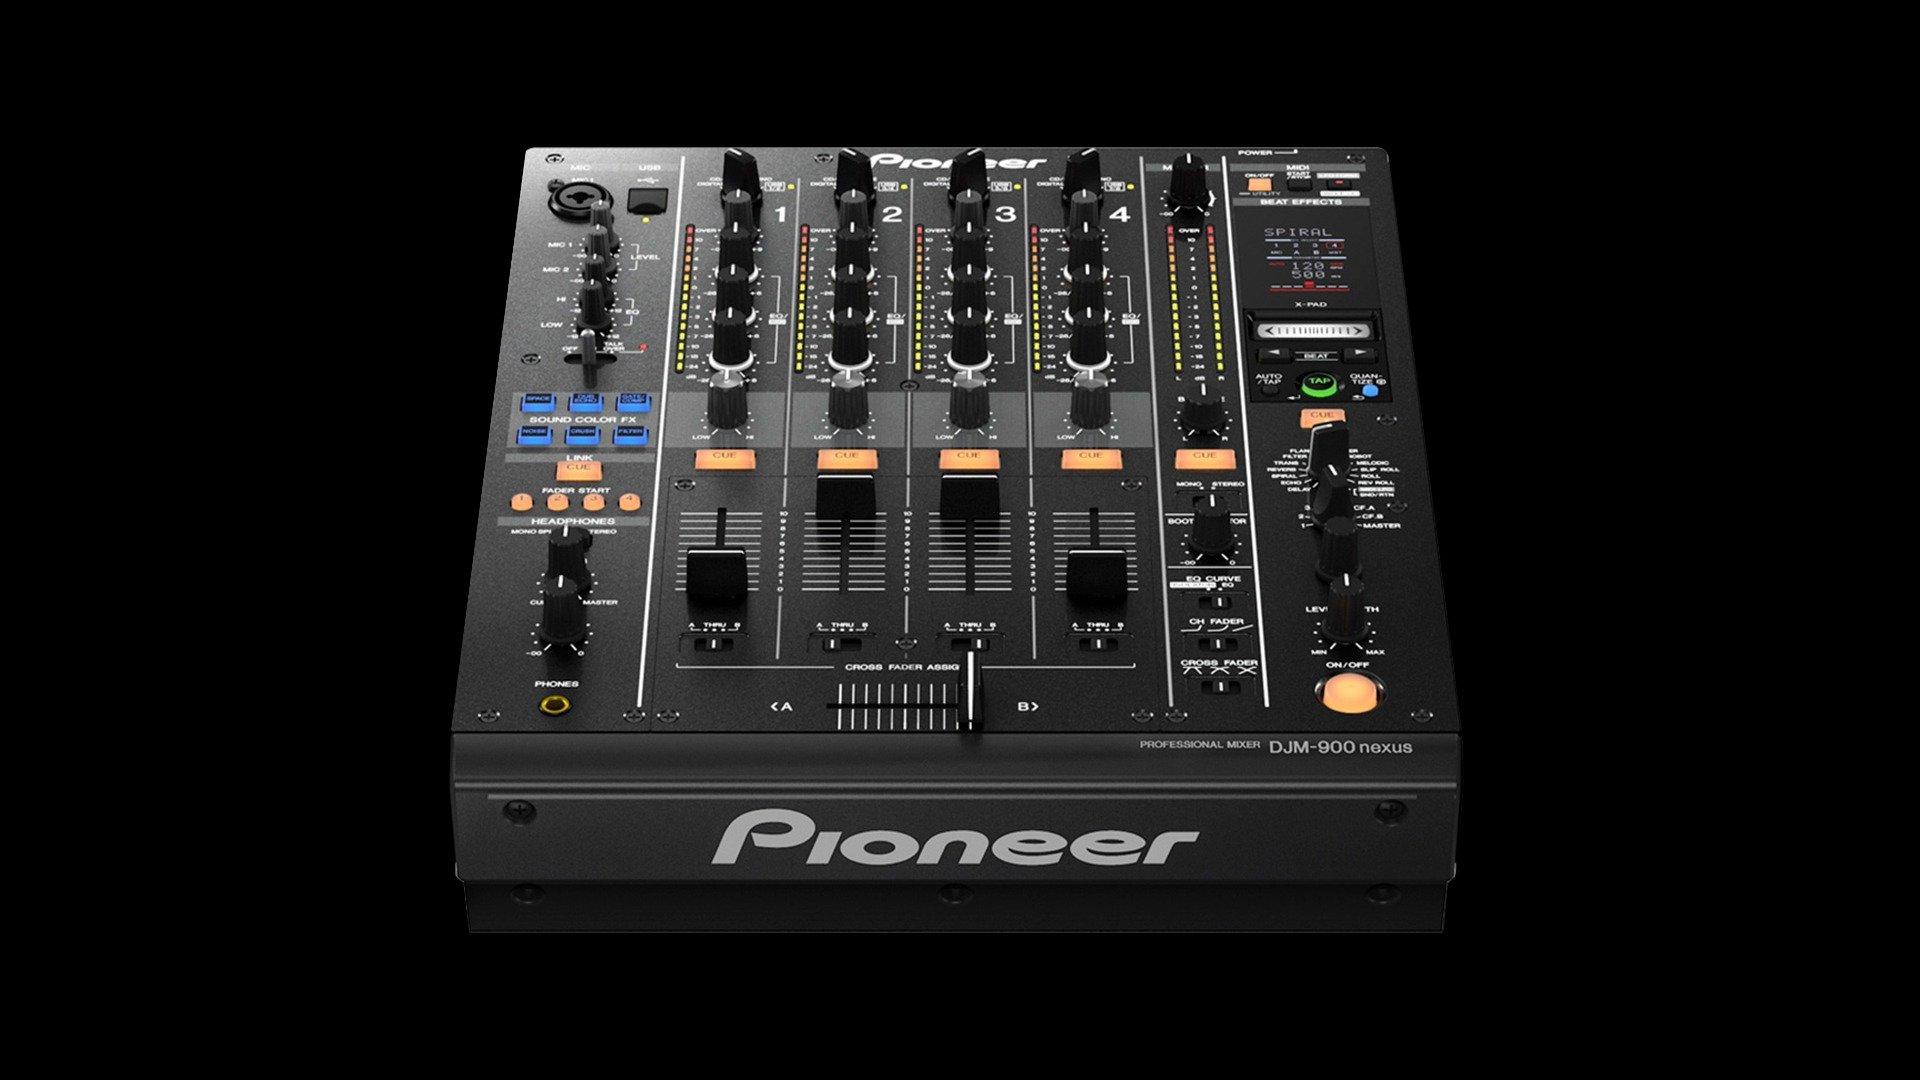 pioneer-djm-900nxs-hero-shot-xl